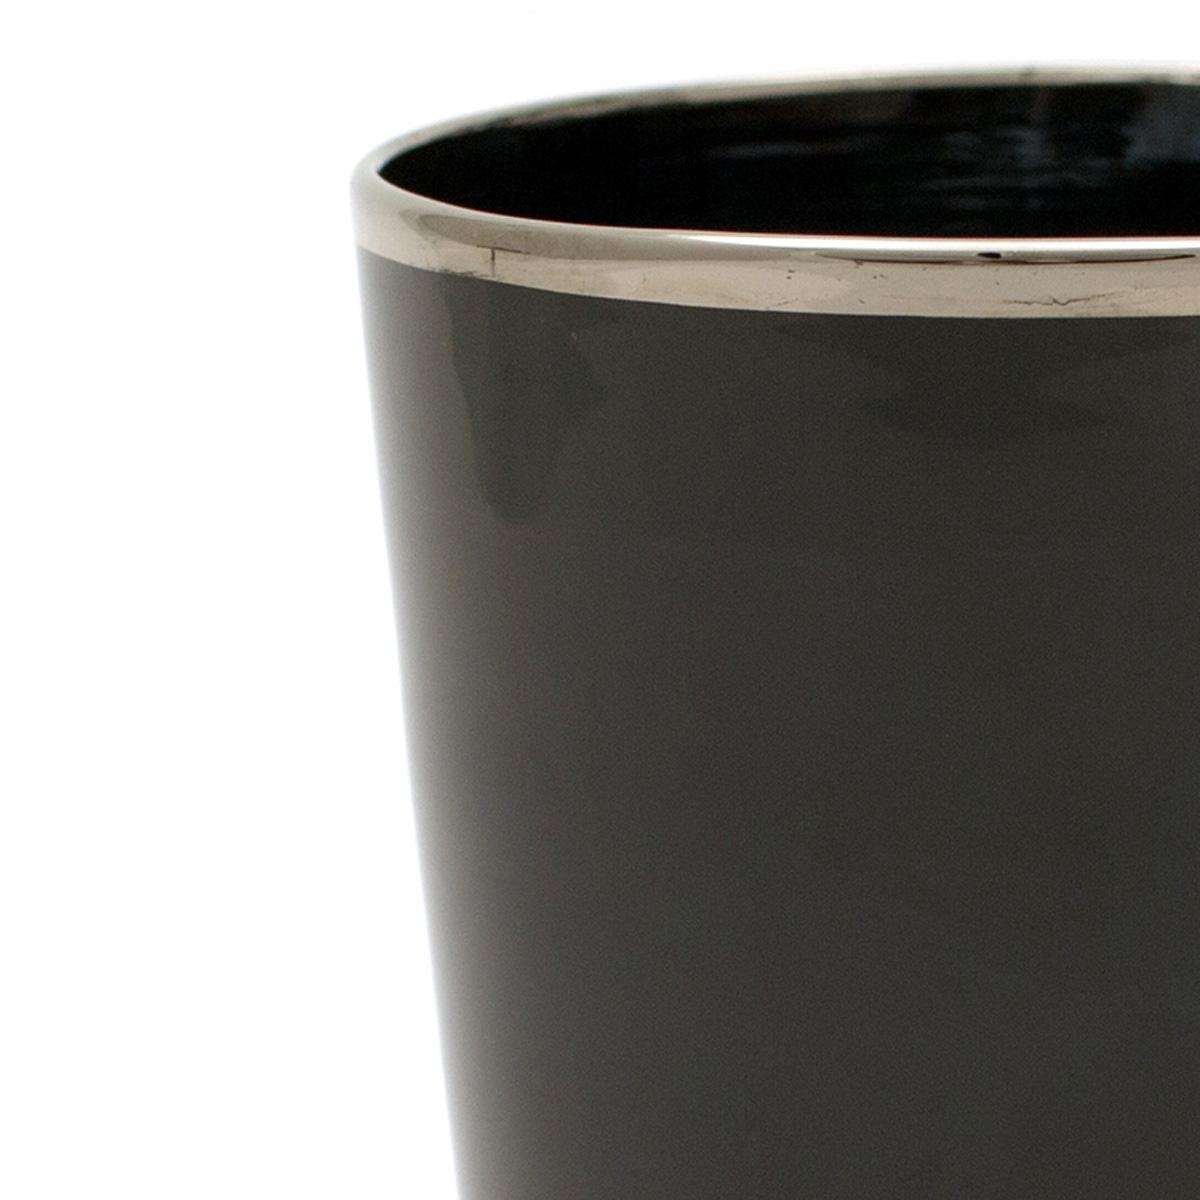 drink_vaso_glass_luxury_interior_design_murano_handmade_black platinum_detail